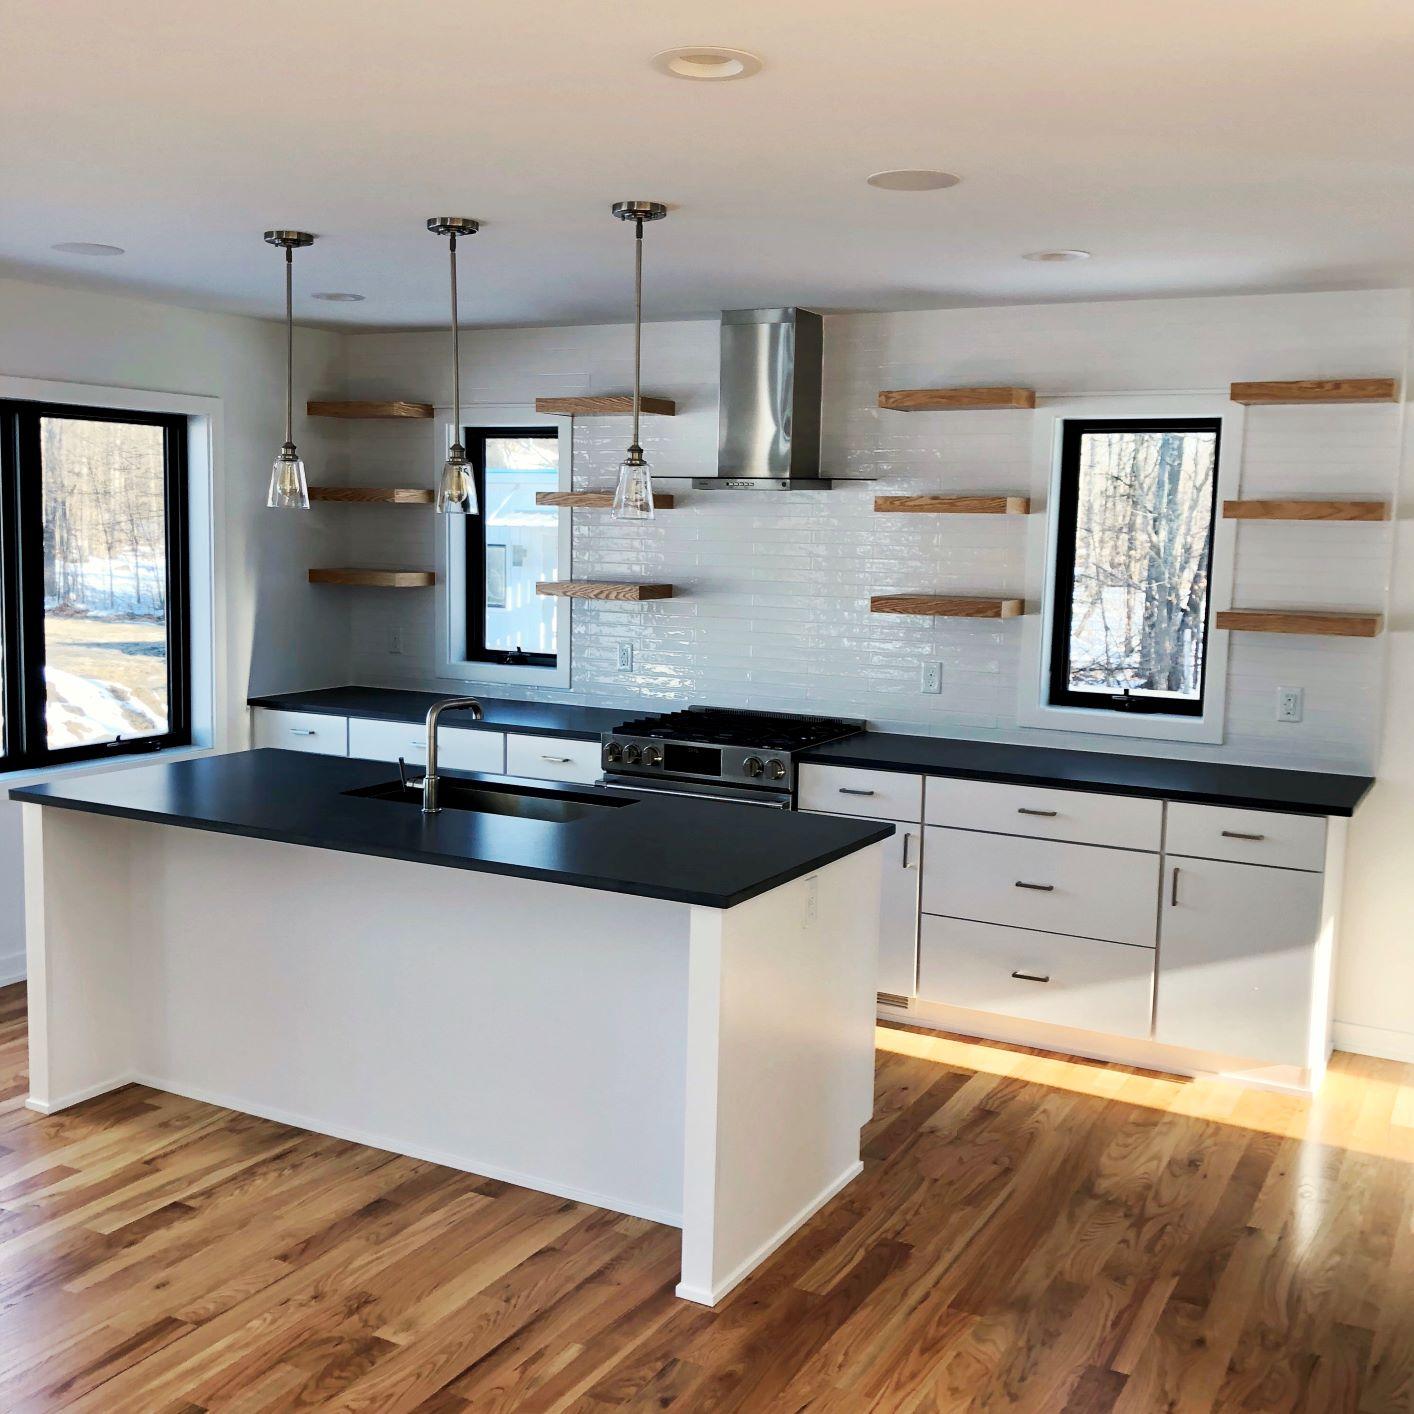 Apuzzo Kitchens Custom Cabinetry